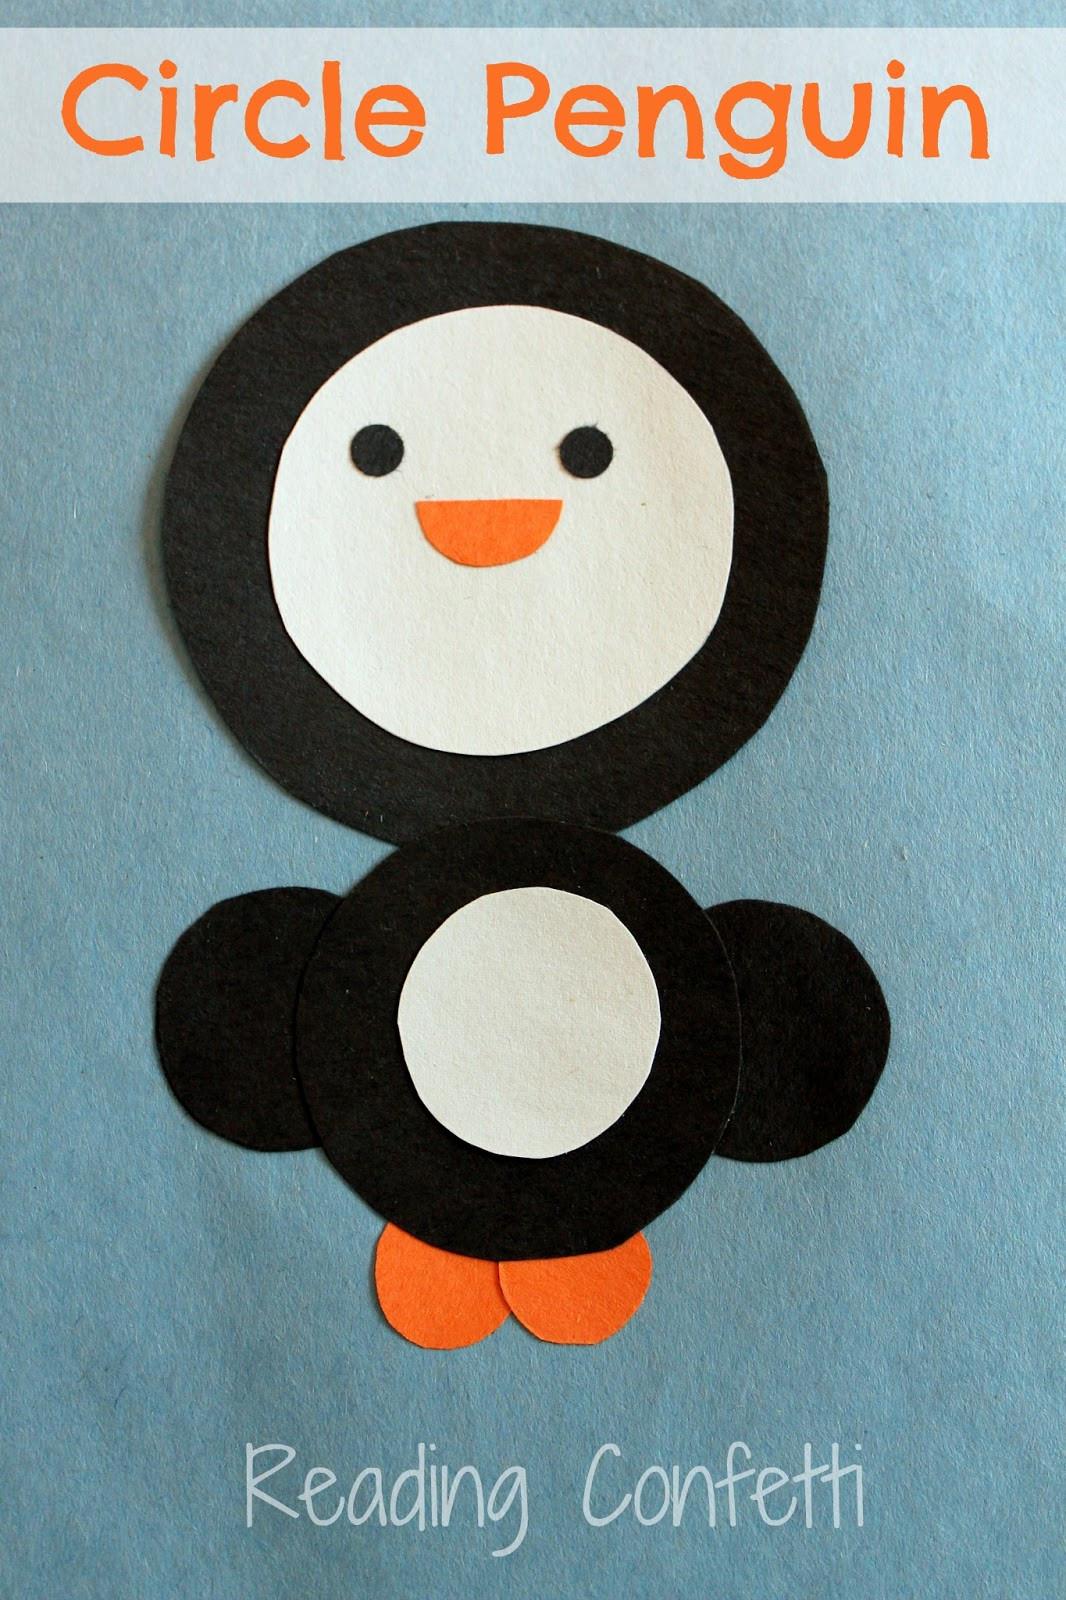 Penguin Craft For Preschoolers  Circle Penguin Craft Reading Confetti